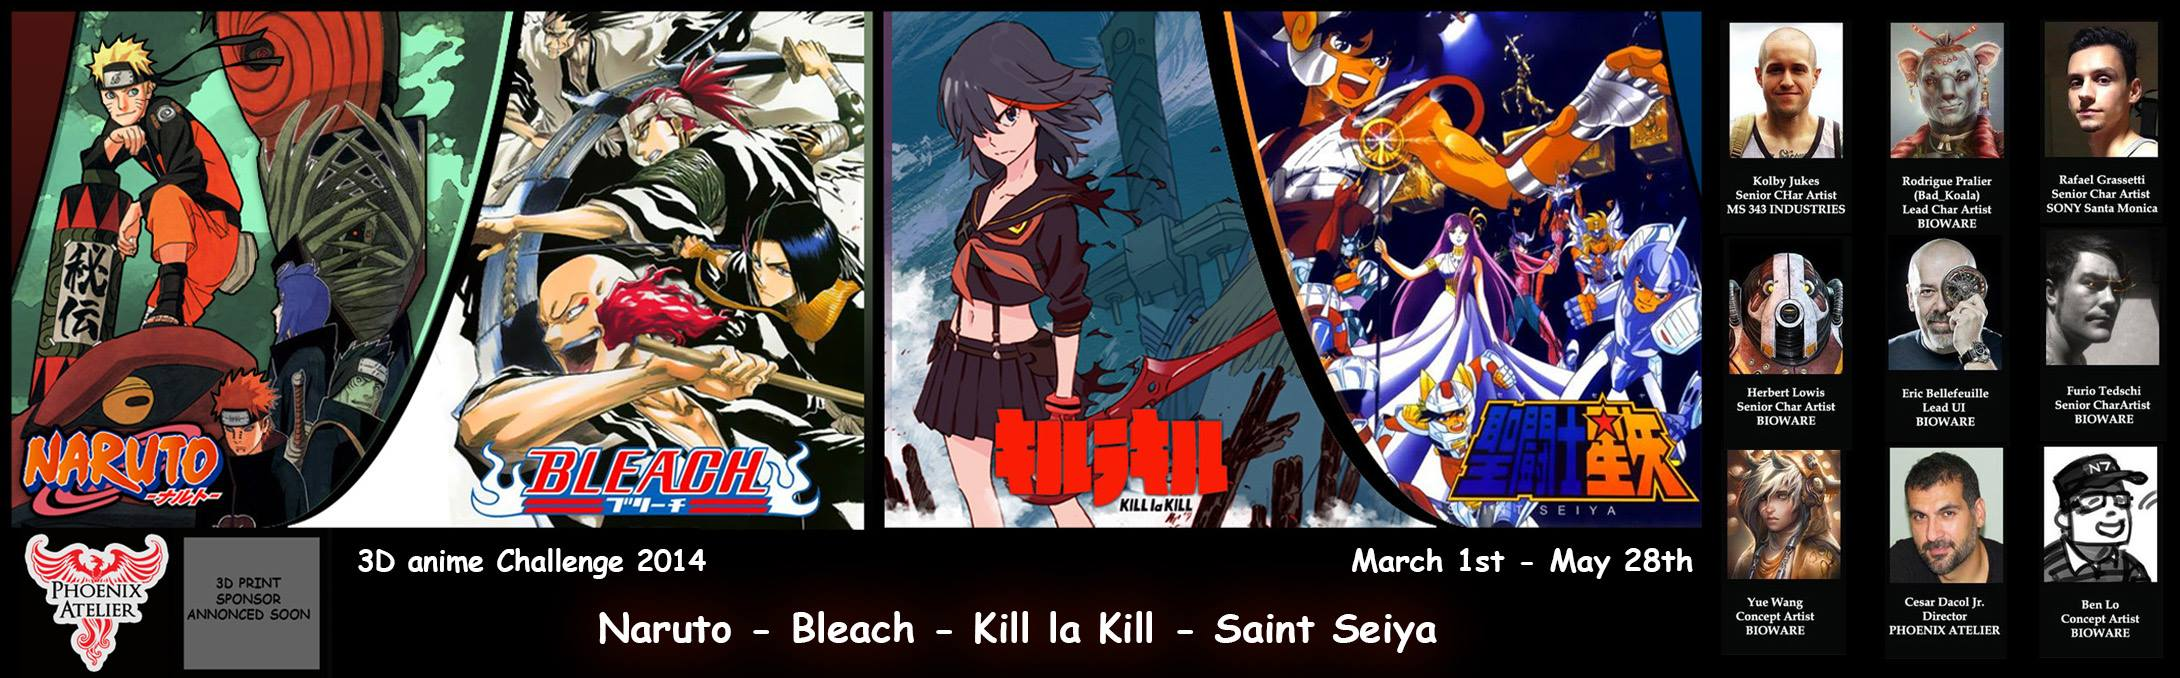 New Anime Contest - Naruto - Bleach - Saint Seiya - Kill la Kill